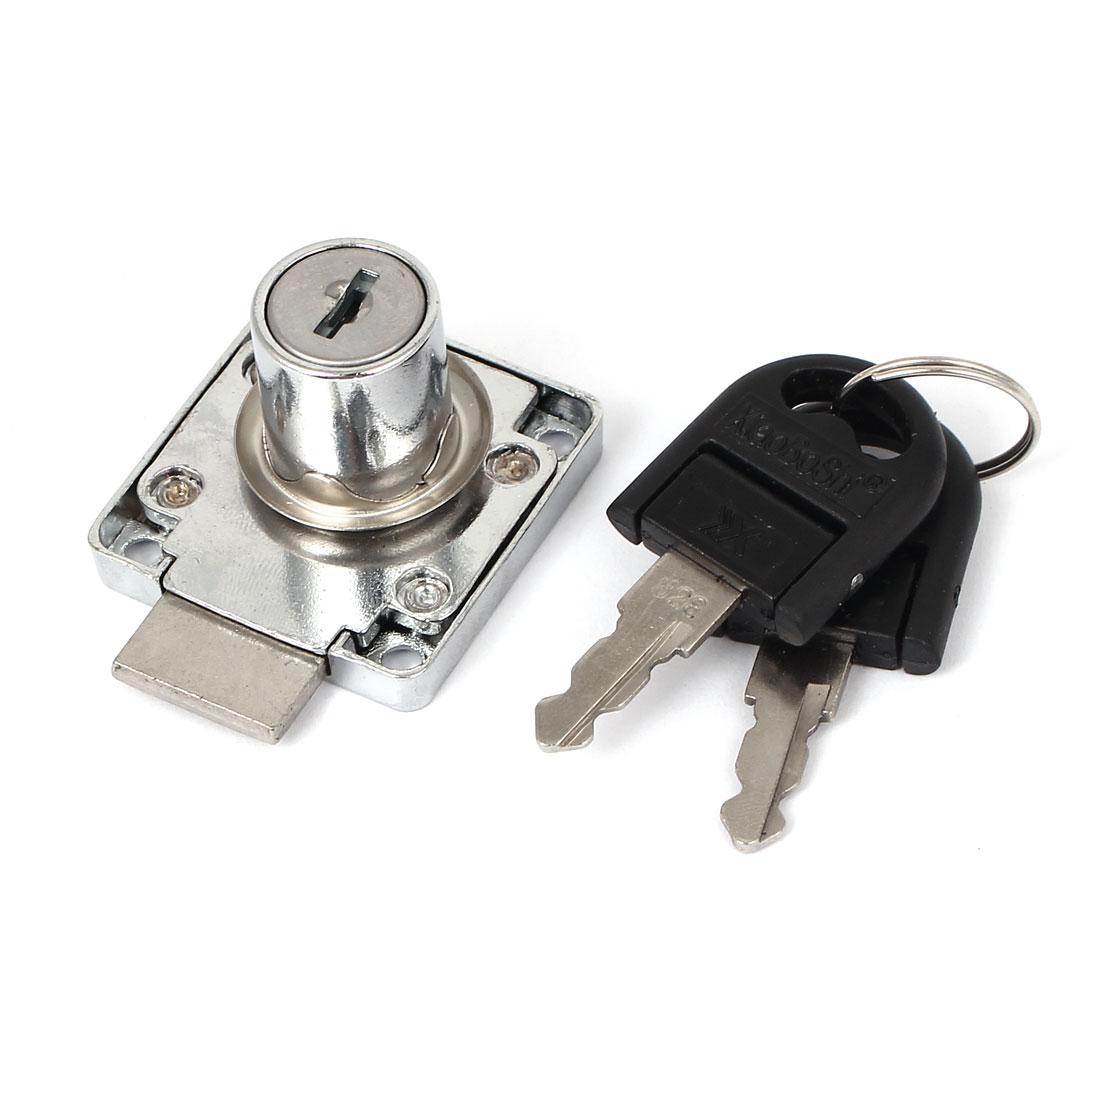 19mm Dia Cylinder Deadbolt Table Drawer Cabinet Security Key Lock Locker